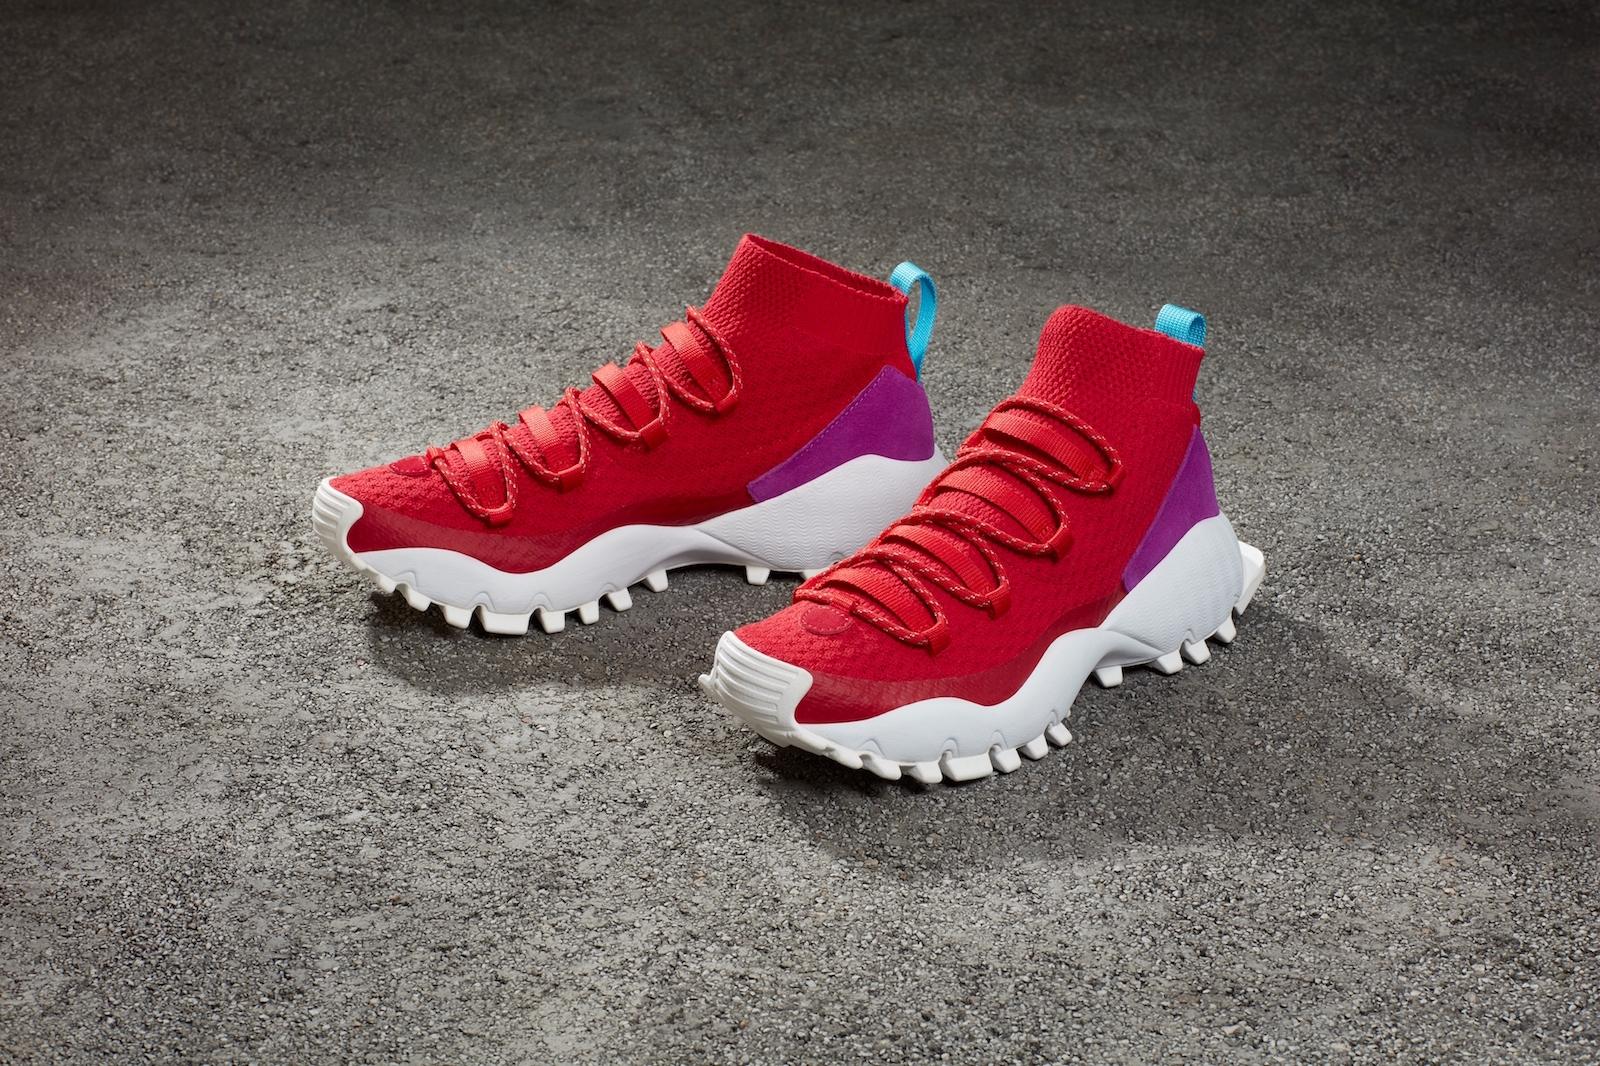 adidas originals seeulater primeknit winter 2 WearTesters